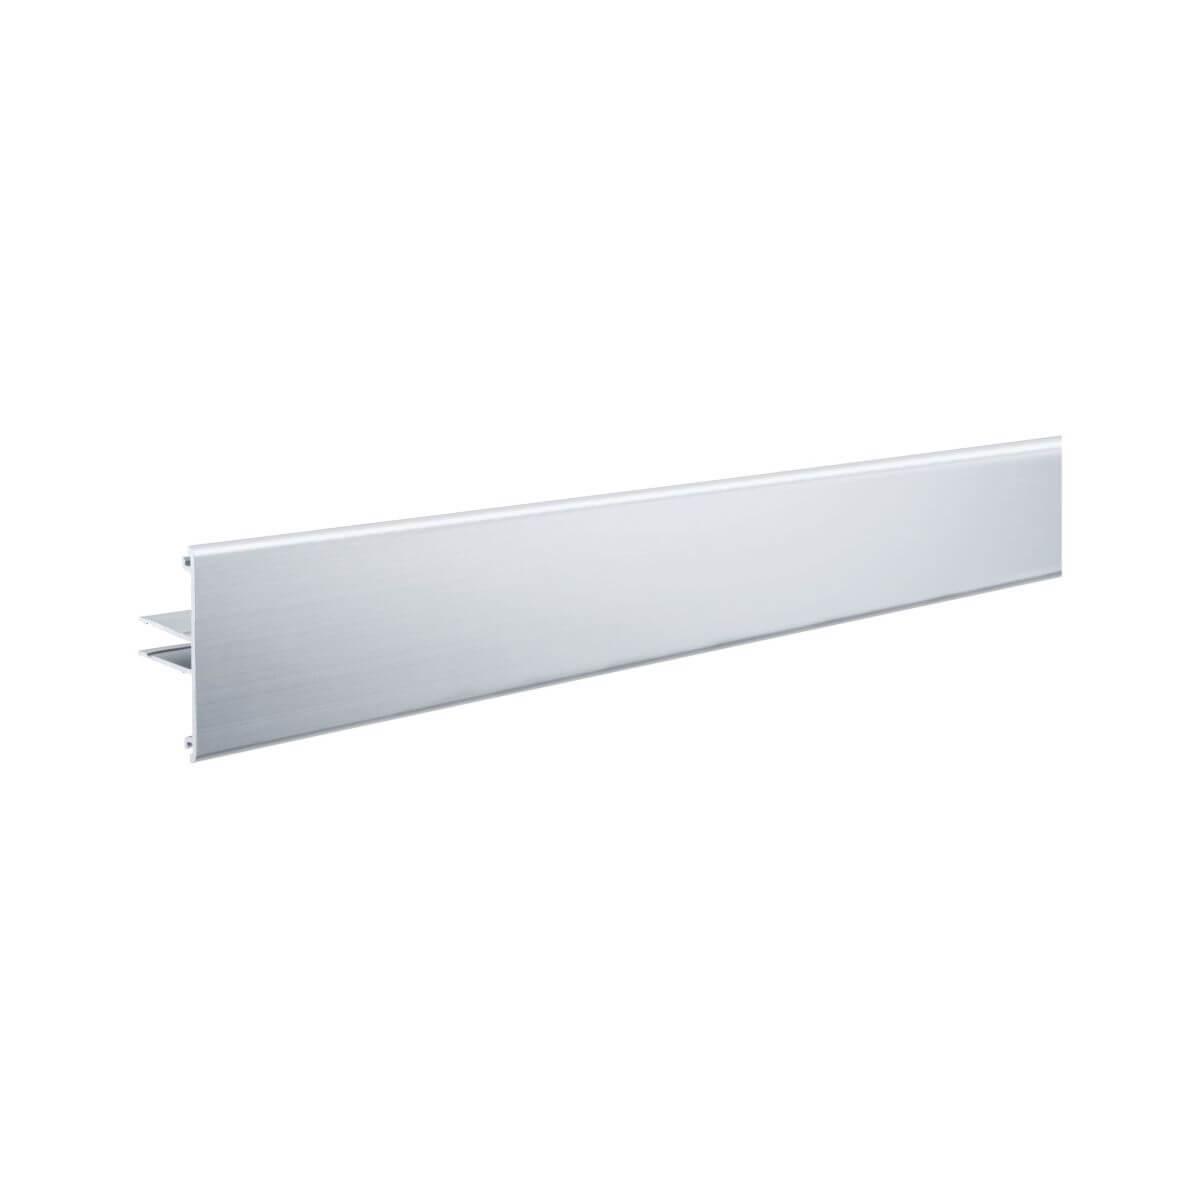 PaulmannDuo Aluminium Profil 2meloxiert